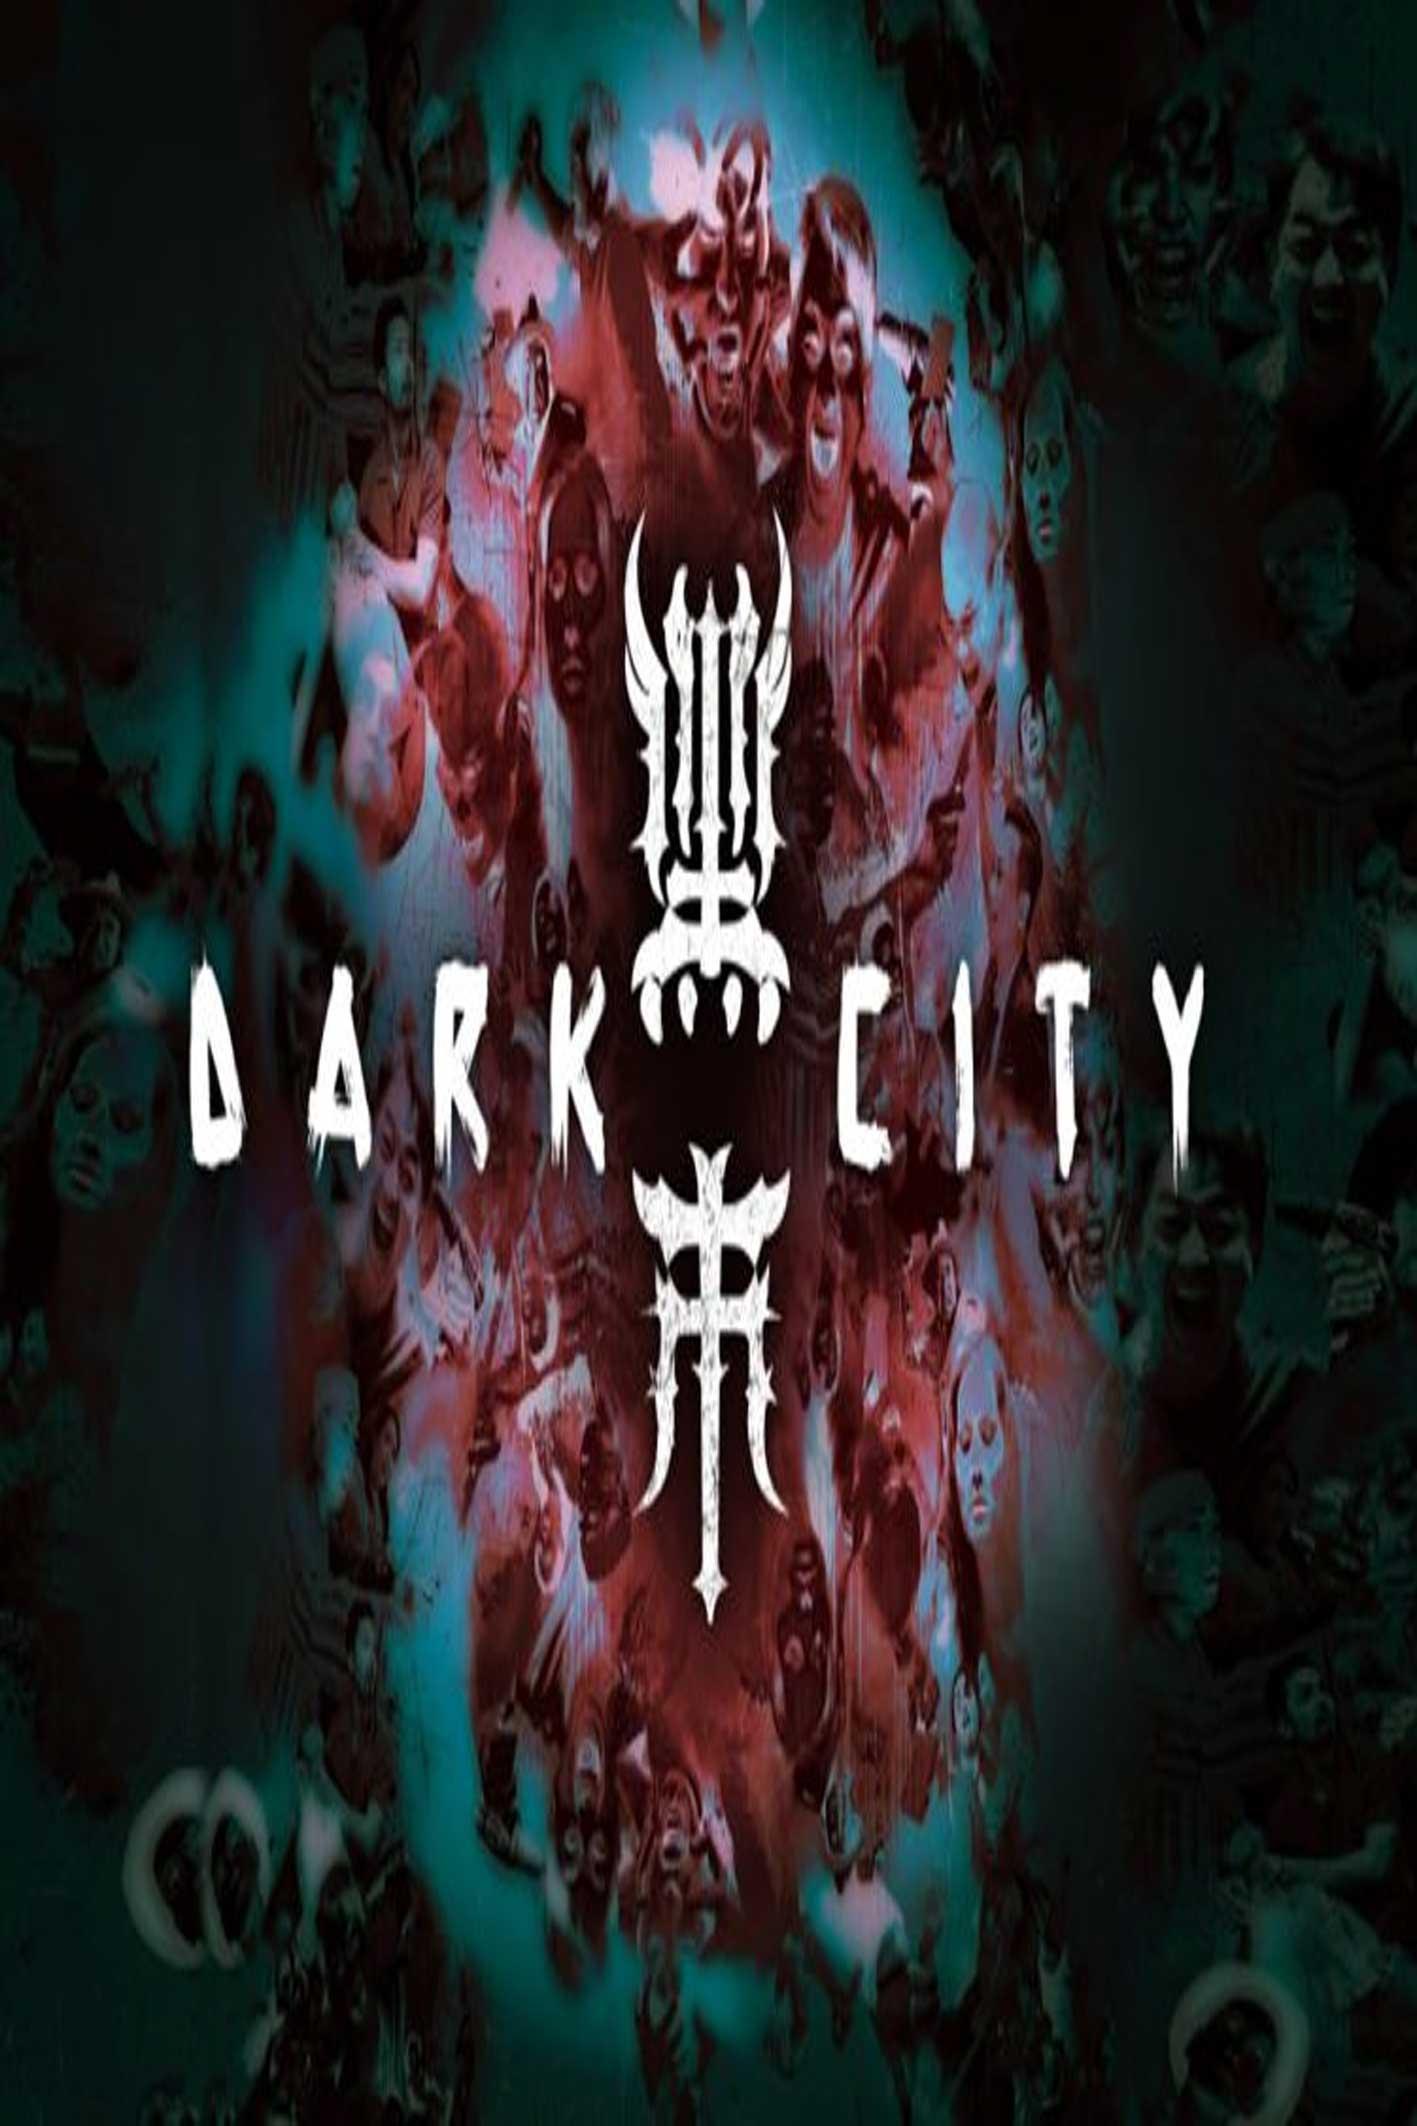 Dark City - 黑市